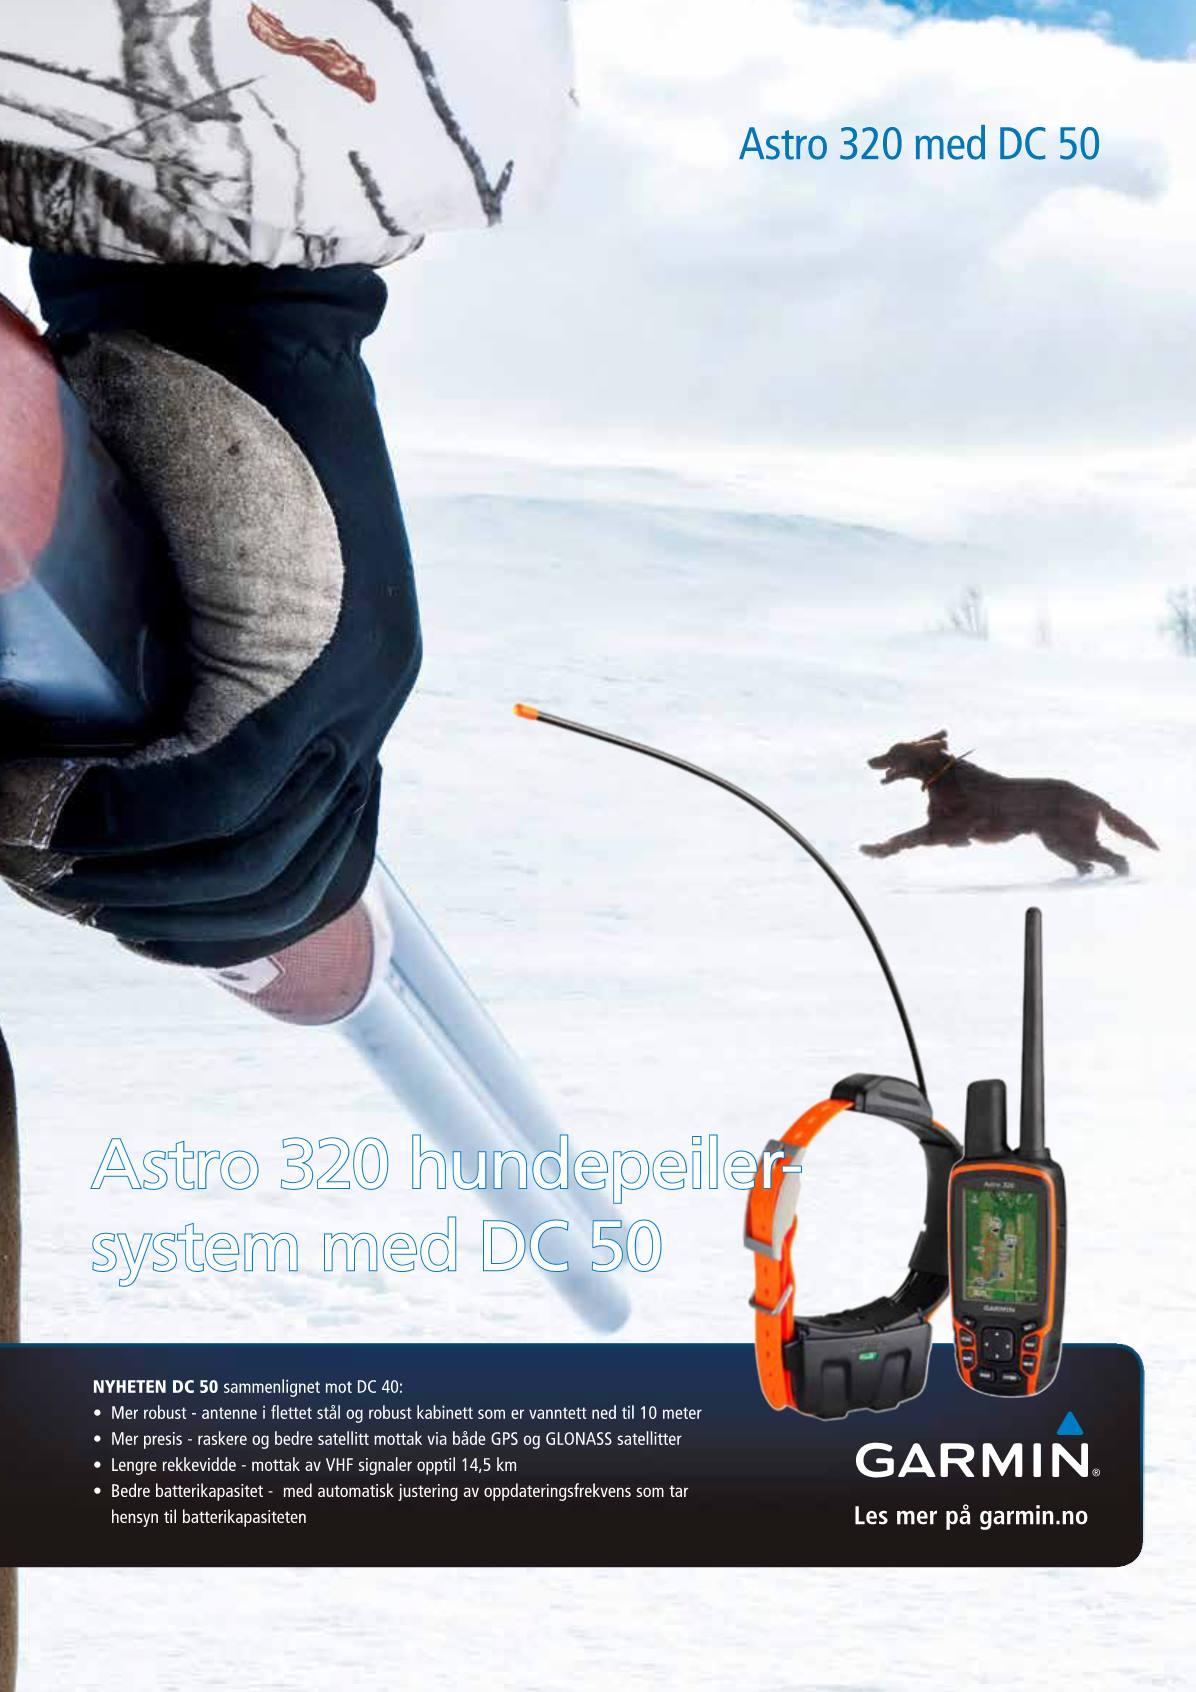 antenne astro 320